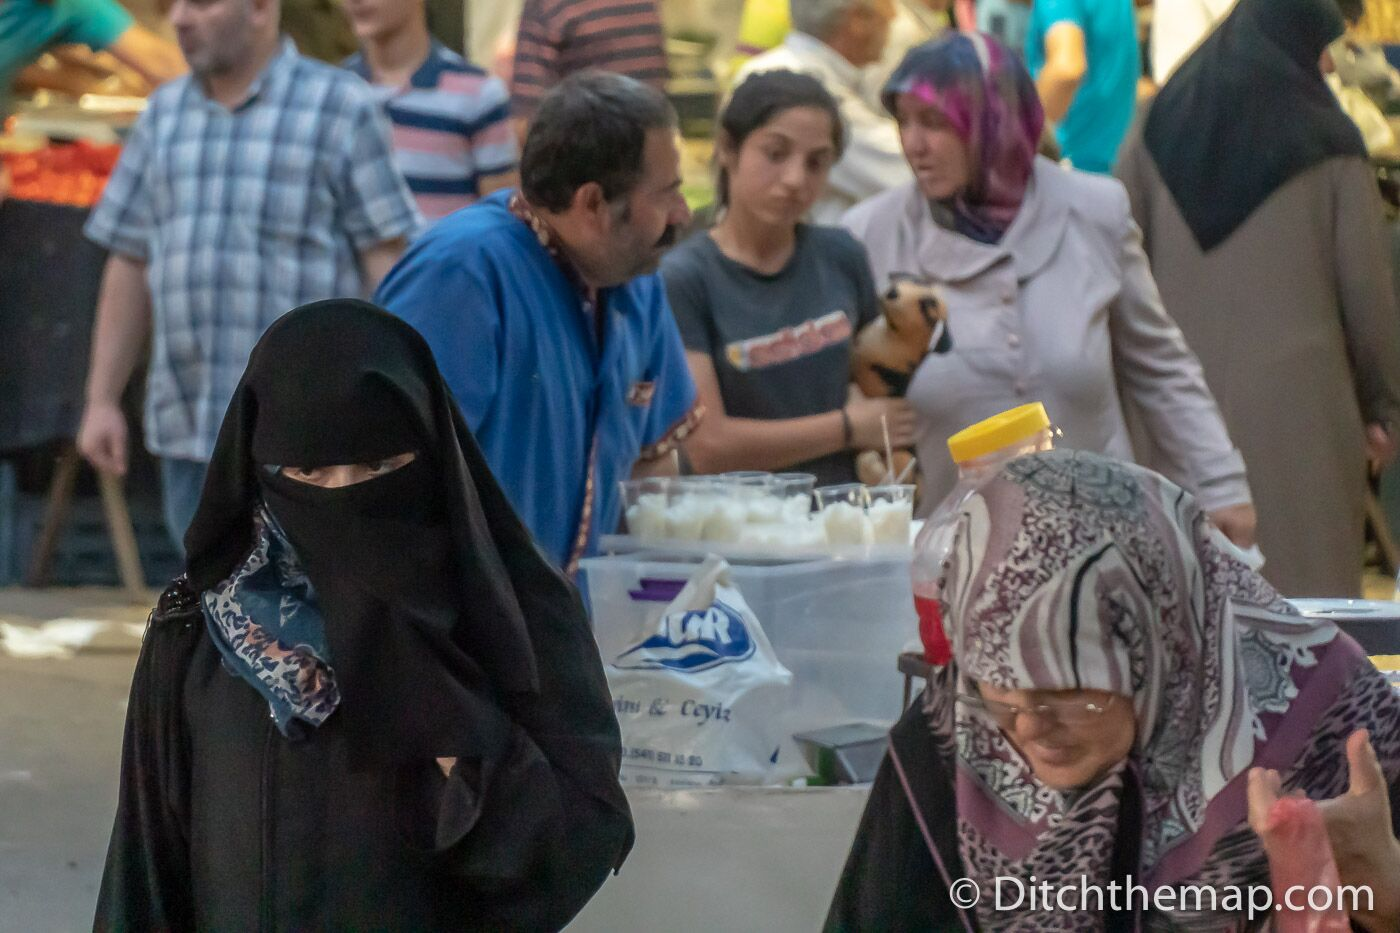 A woman wears a niqab in a market in Sanliurfa, Turkey